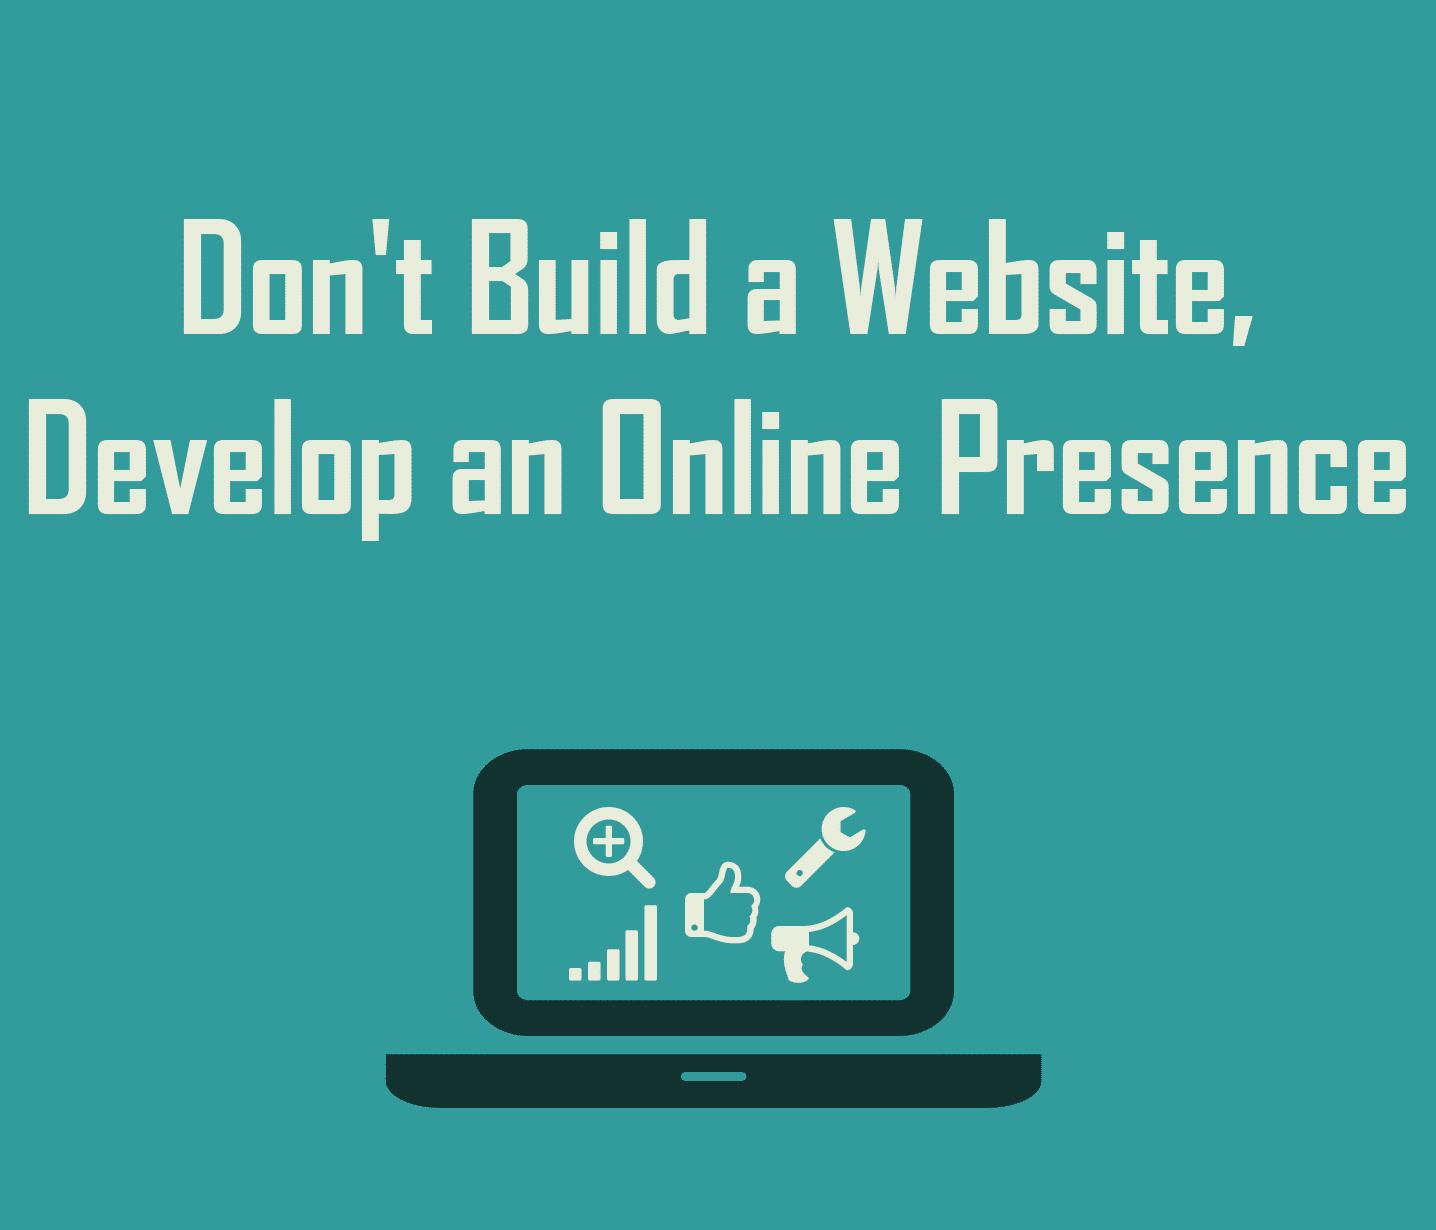 Don't build a website, develop an online presence